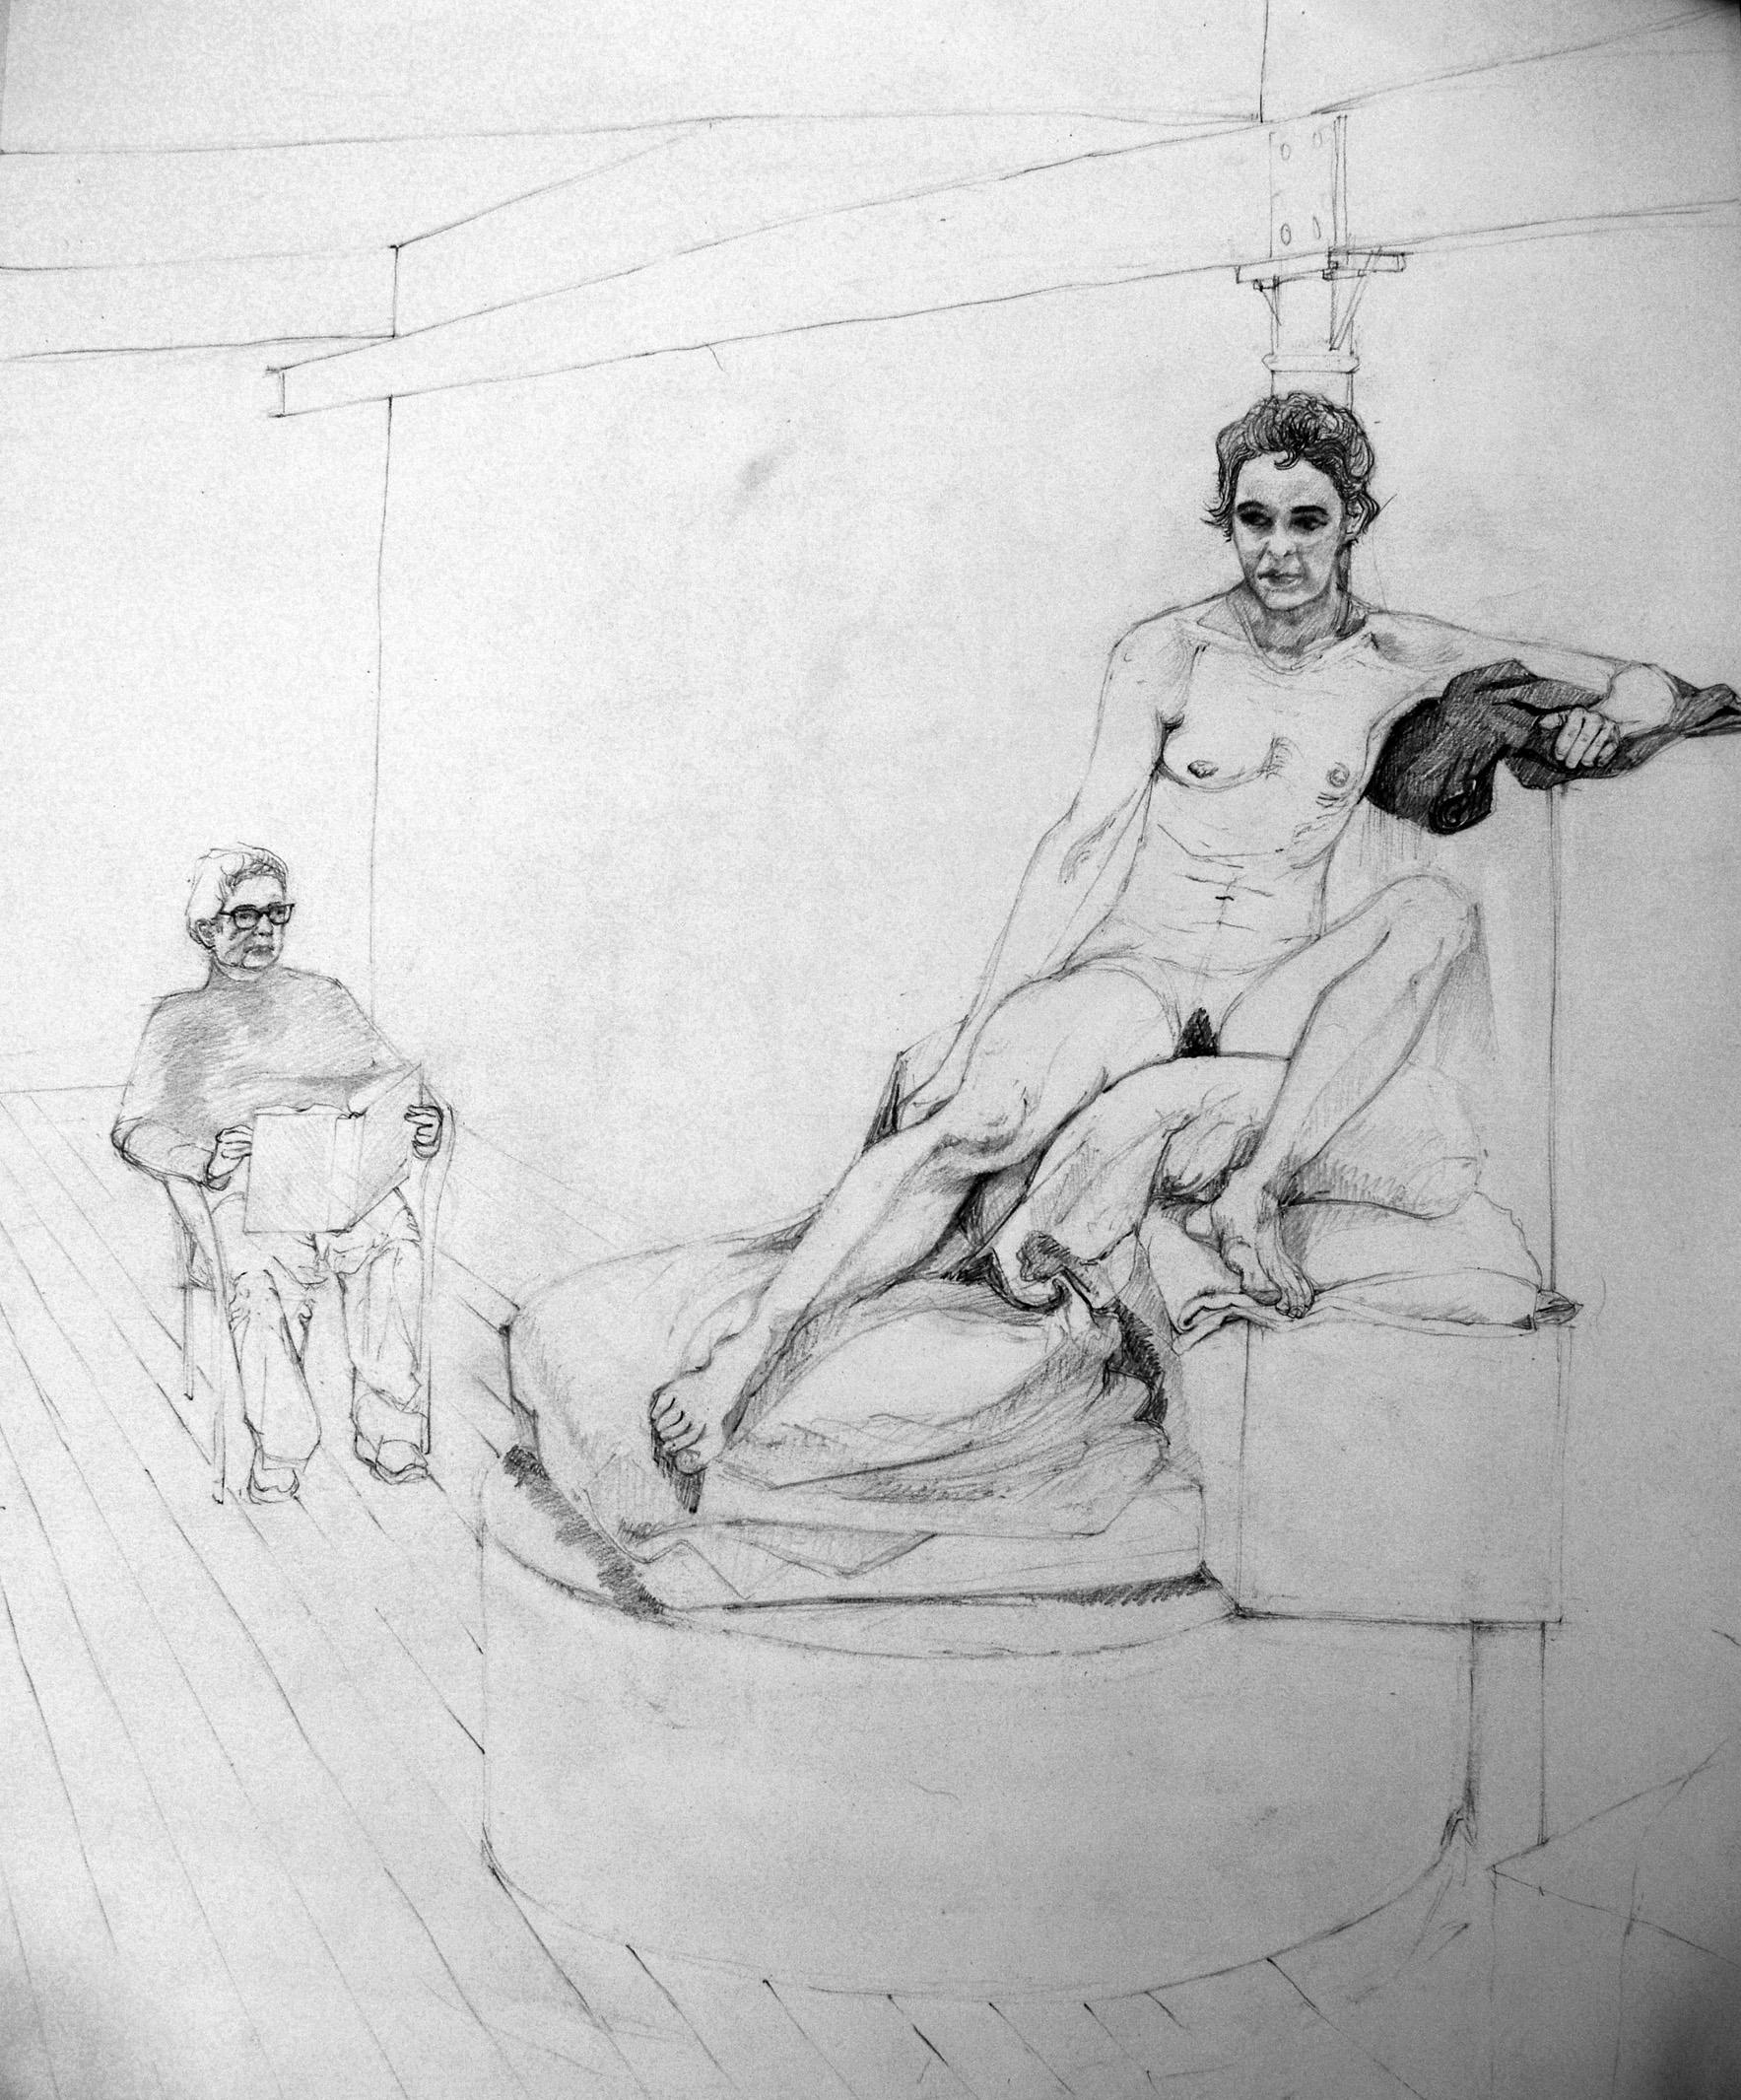 5. Untitled_65x50_pencil on paper.jpg